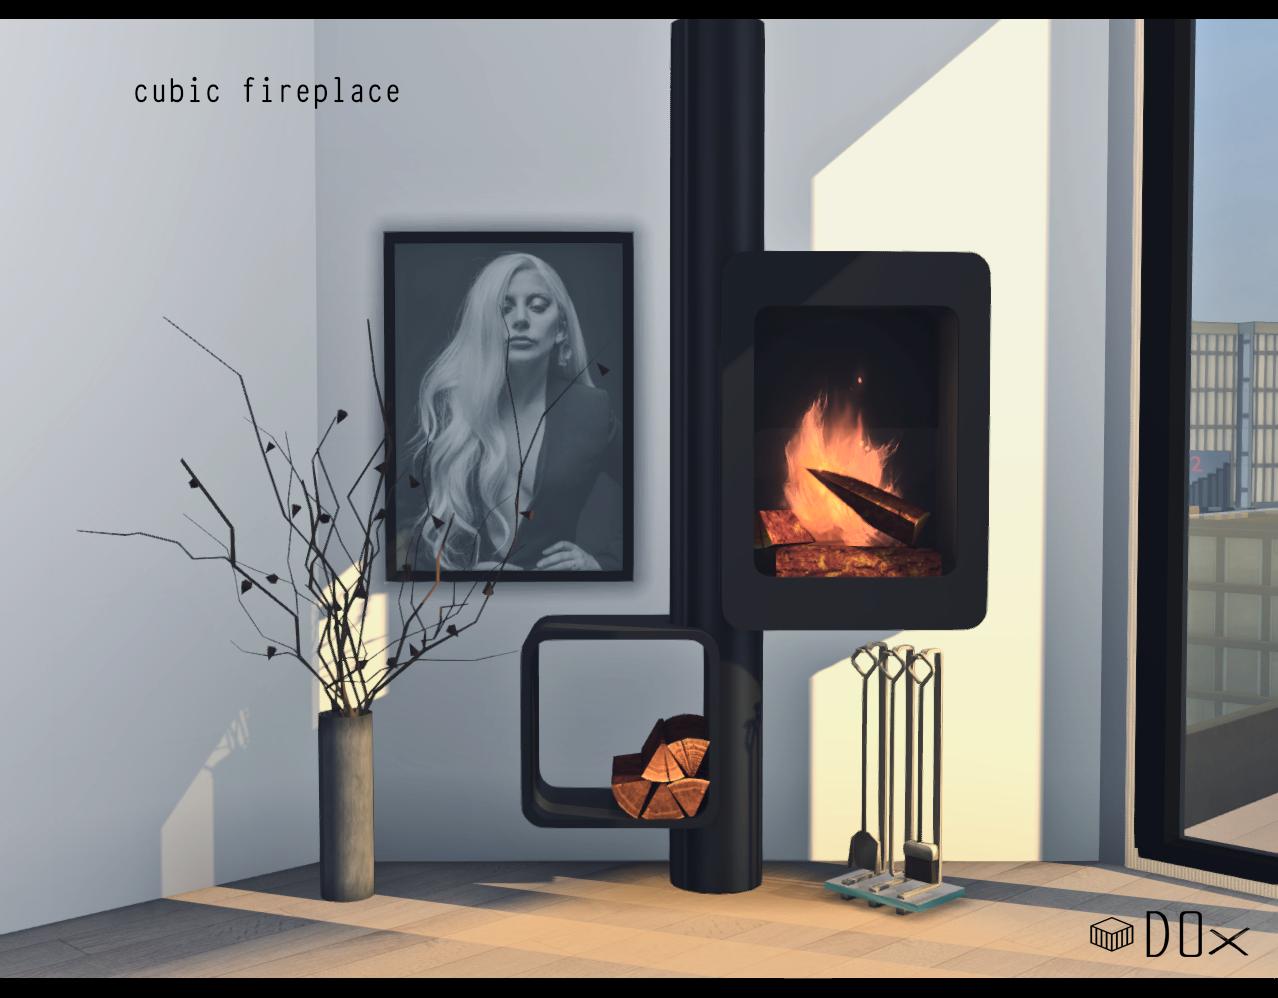 Luxury Fireplace Trio DOX Sims, Sims 4, Sims 4 mods